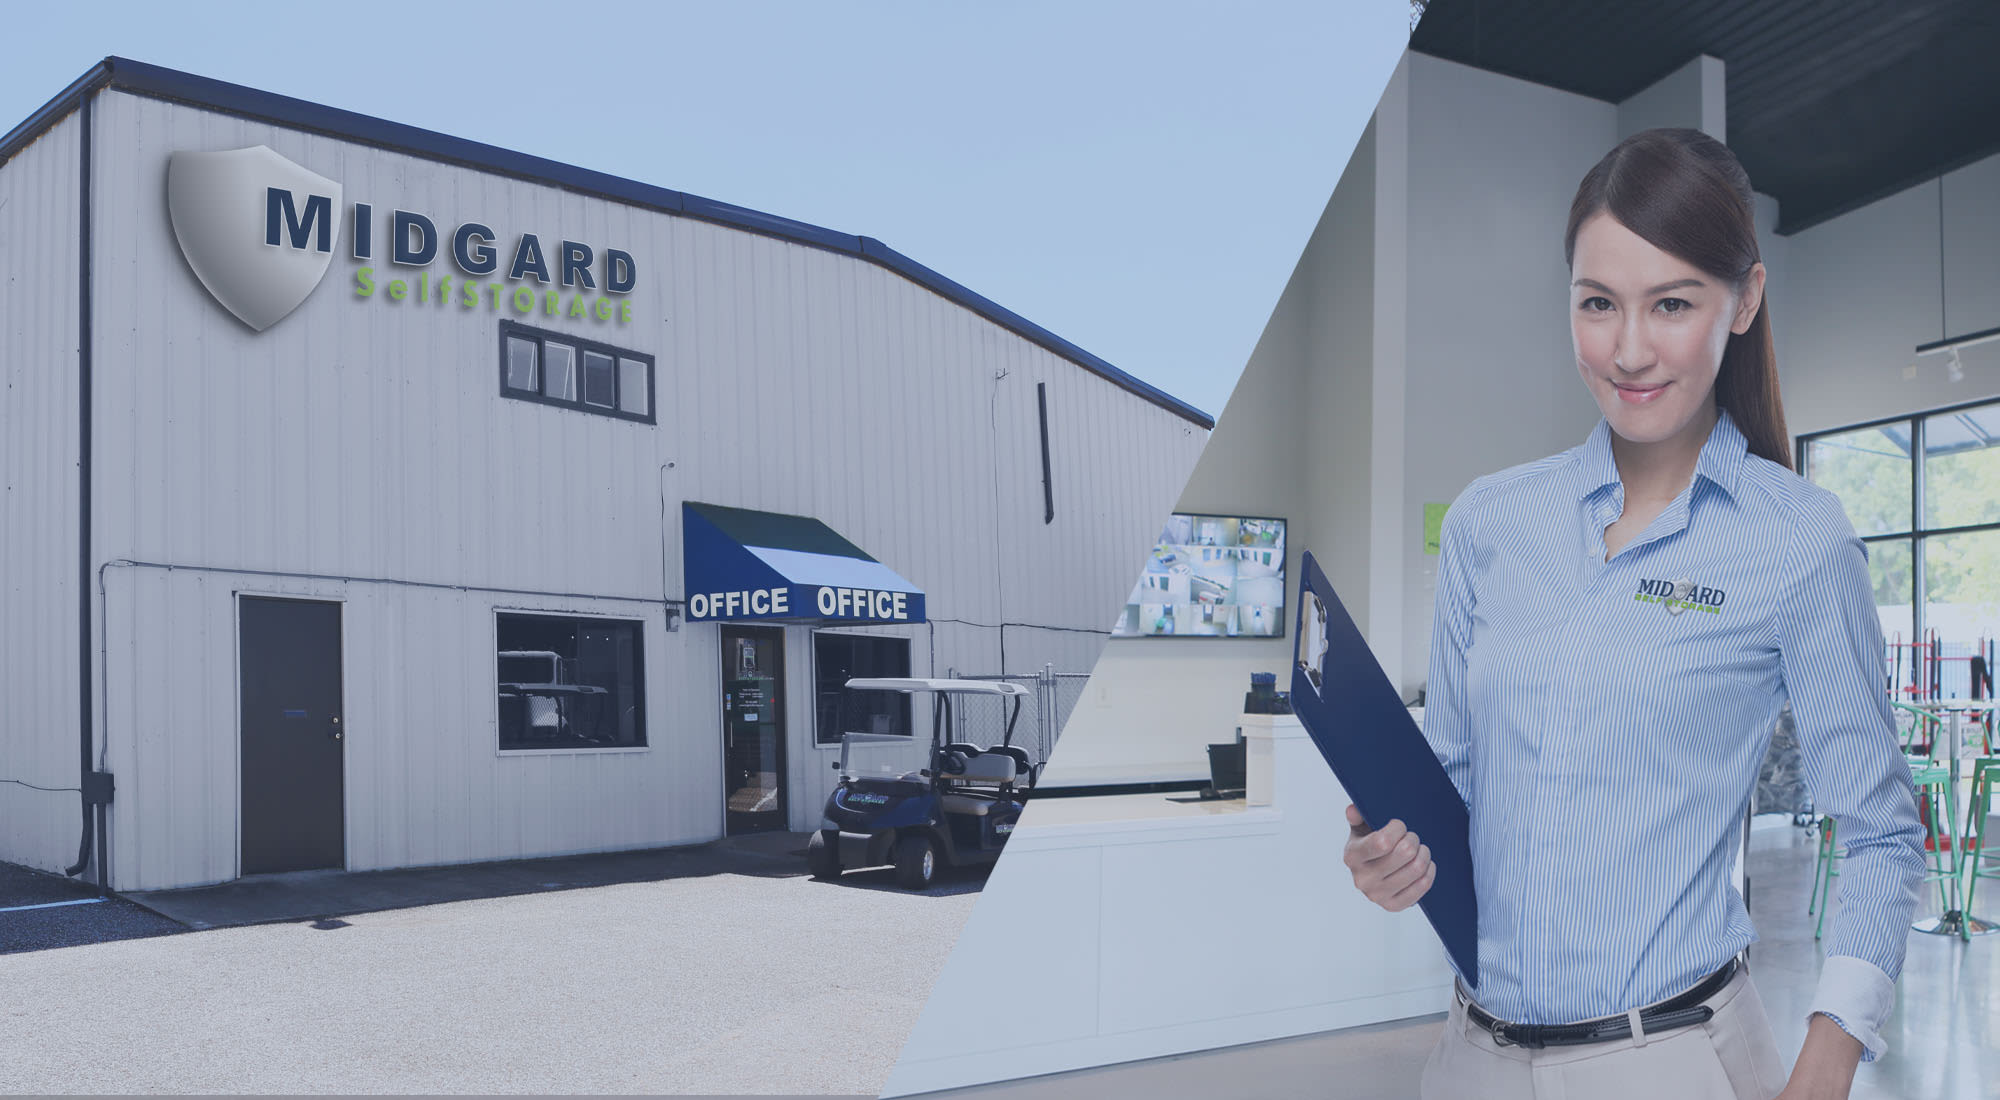 Self storage at Midgard Self Storage in Oakland, Tennessee